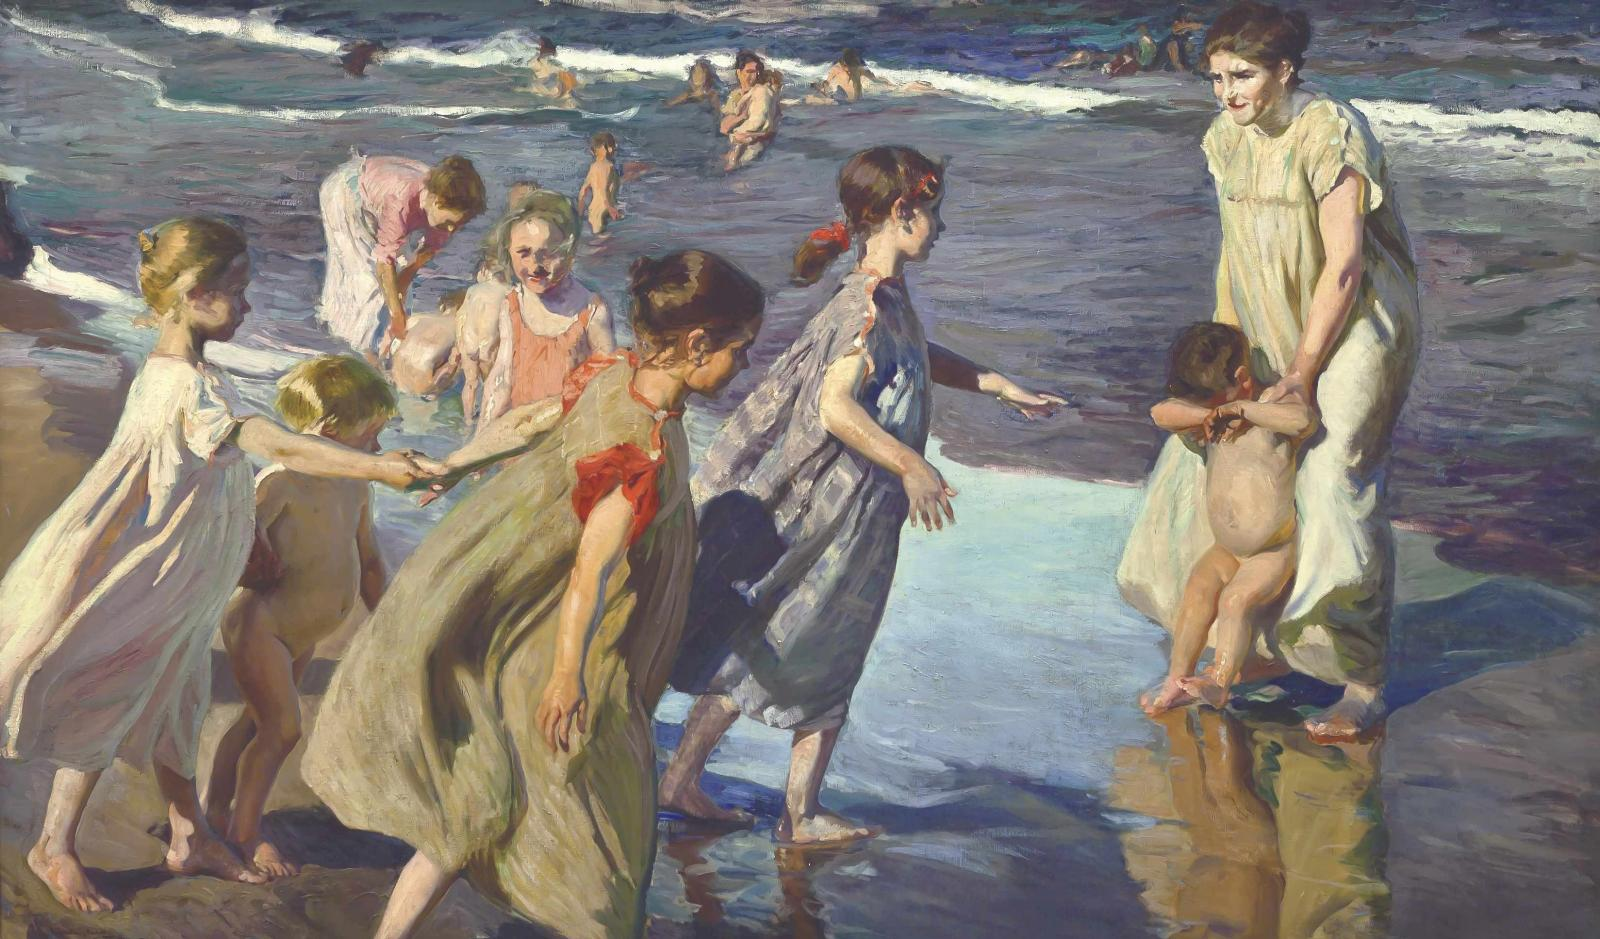 Joaquín Sorolla, L'Été, 1904, huile sur toile, 149x252cm. La Havane, Museo Nacional de Bellas Artes, inv.Nr.93-145. ©La Havane, Muse